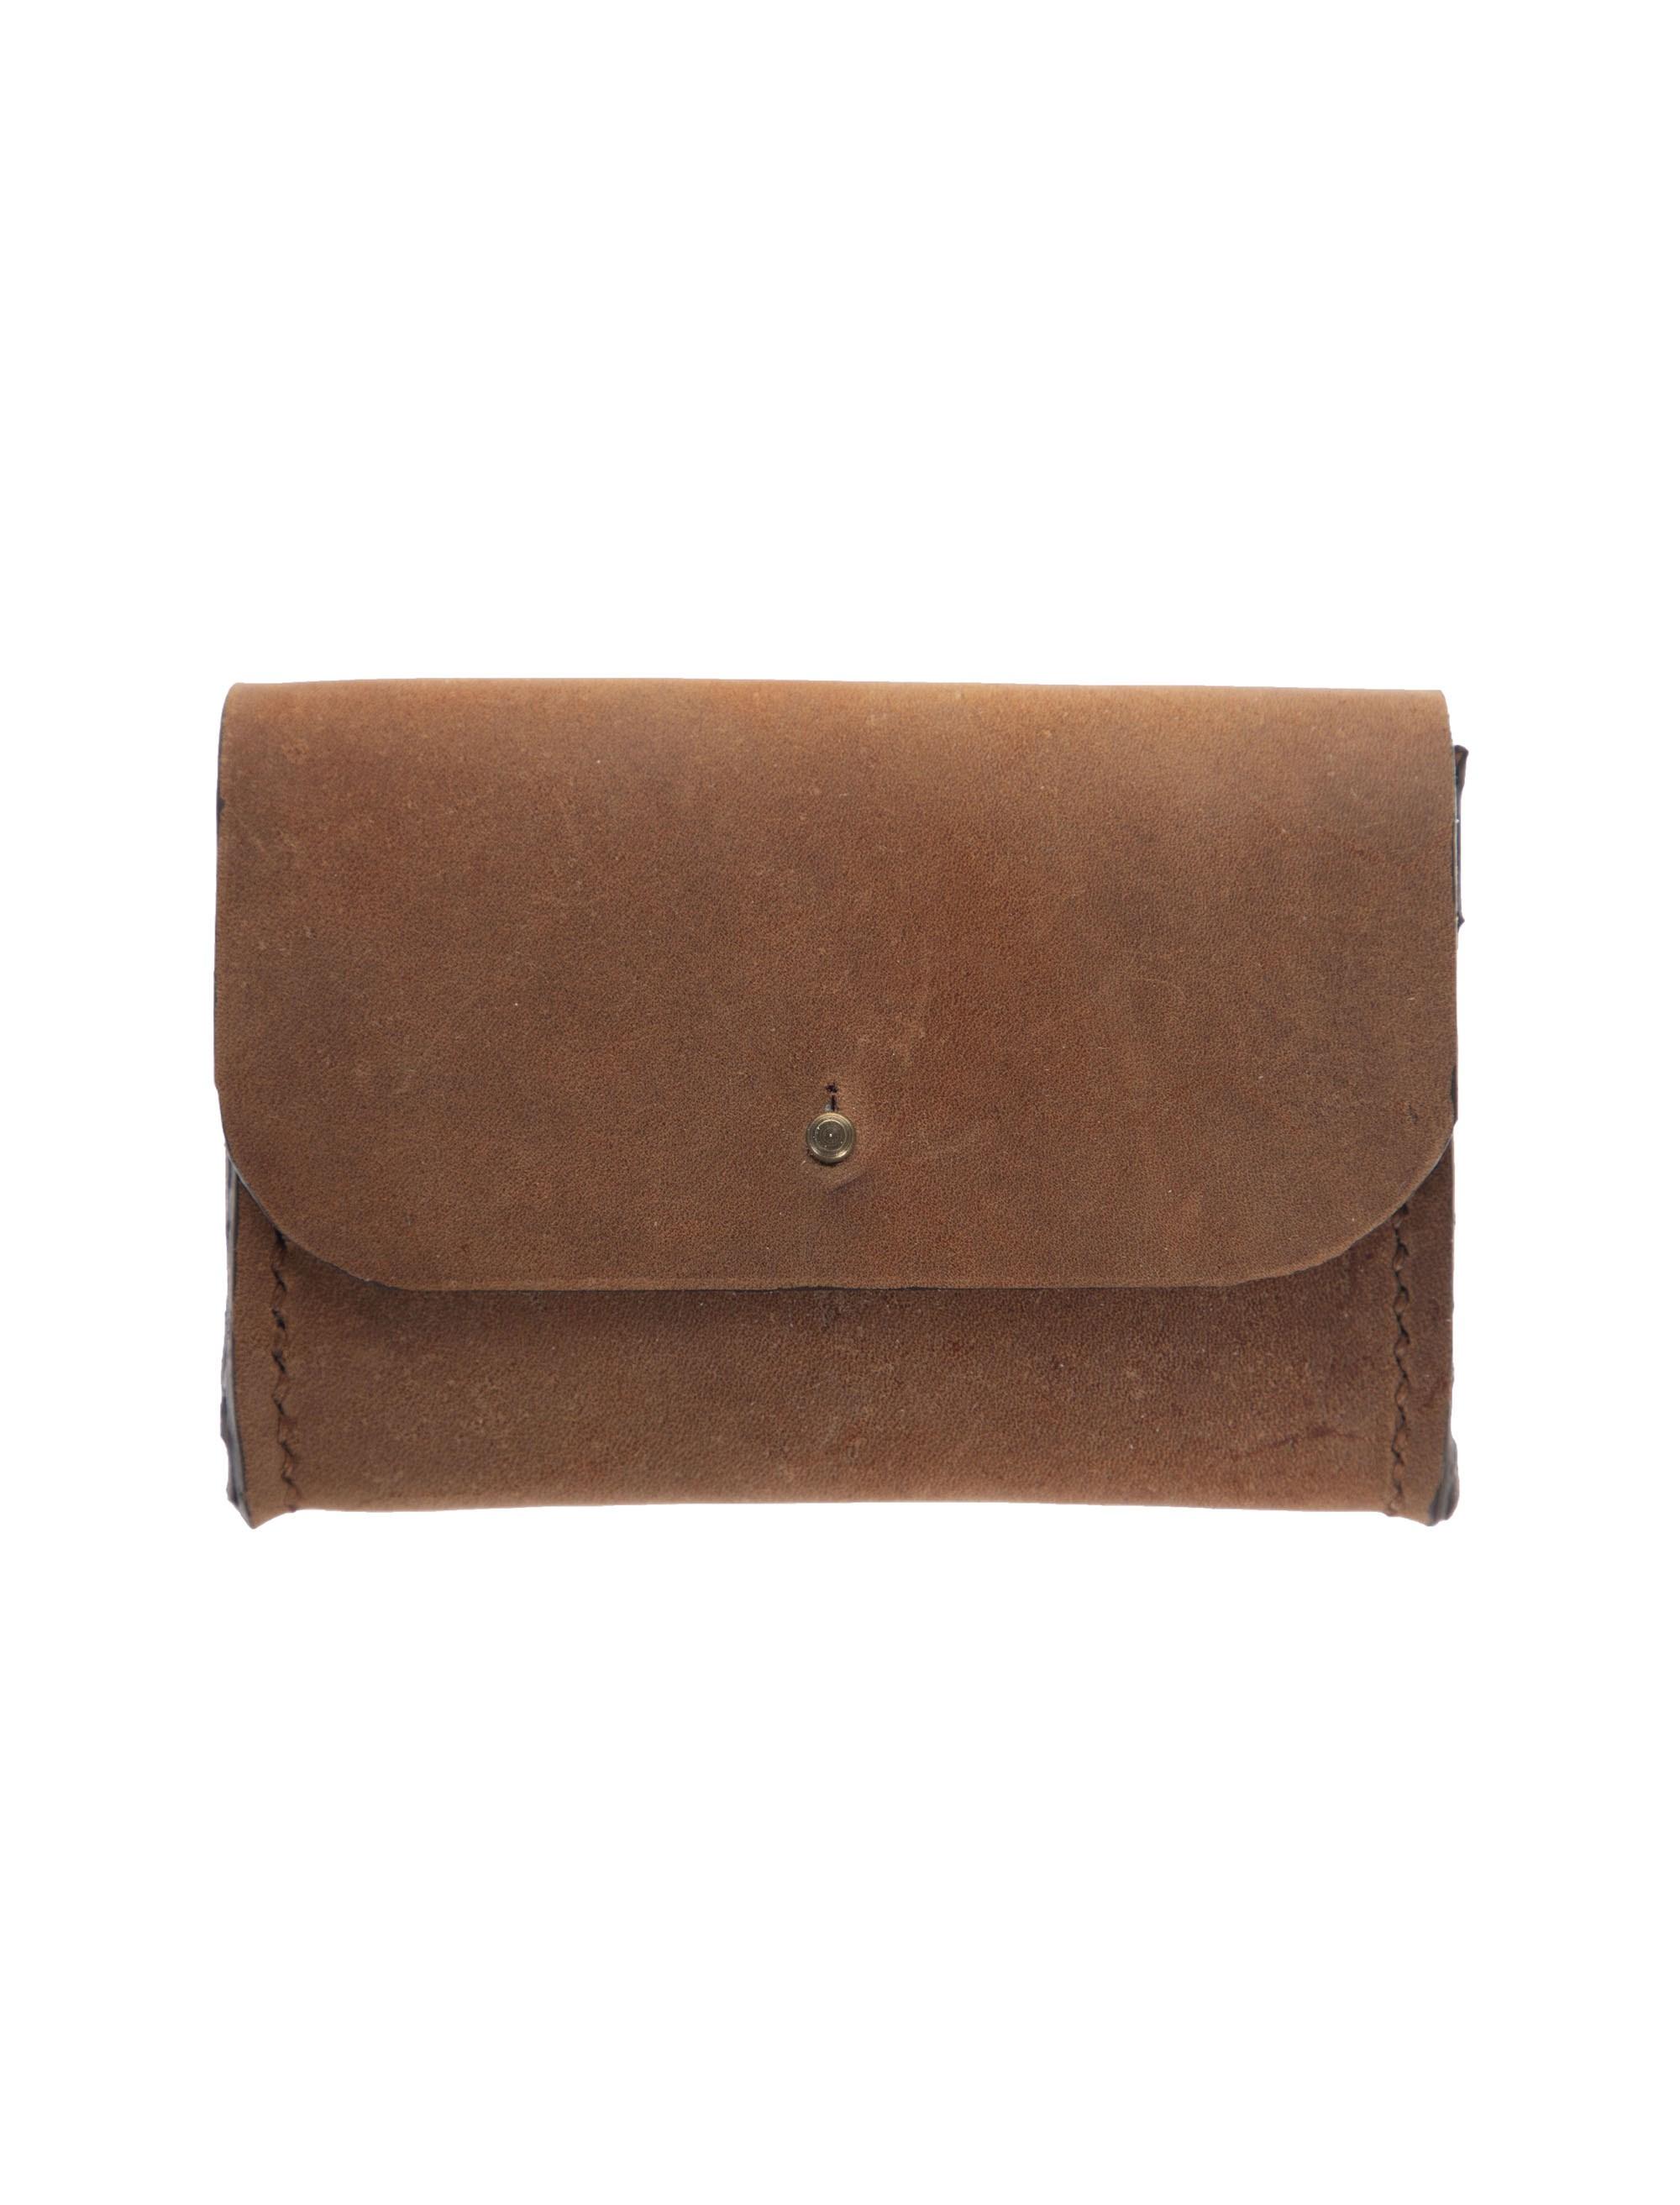 کیف کارت اعتباری چرم بزرگسال - چرم لانکا تک سایز